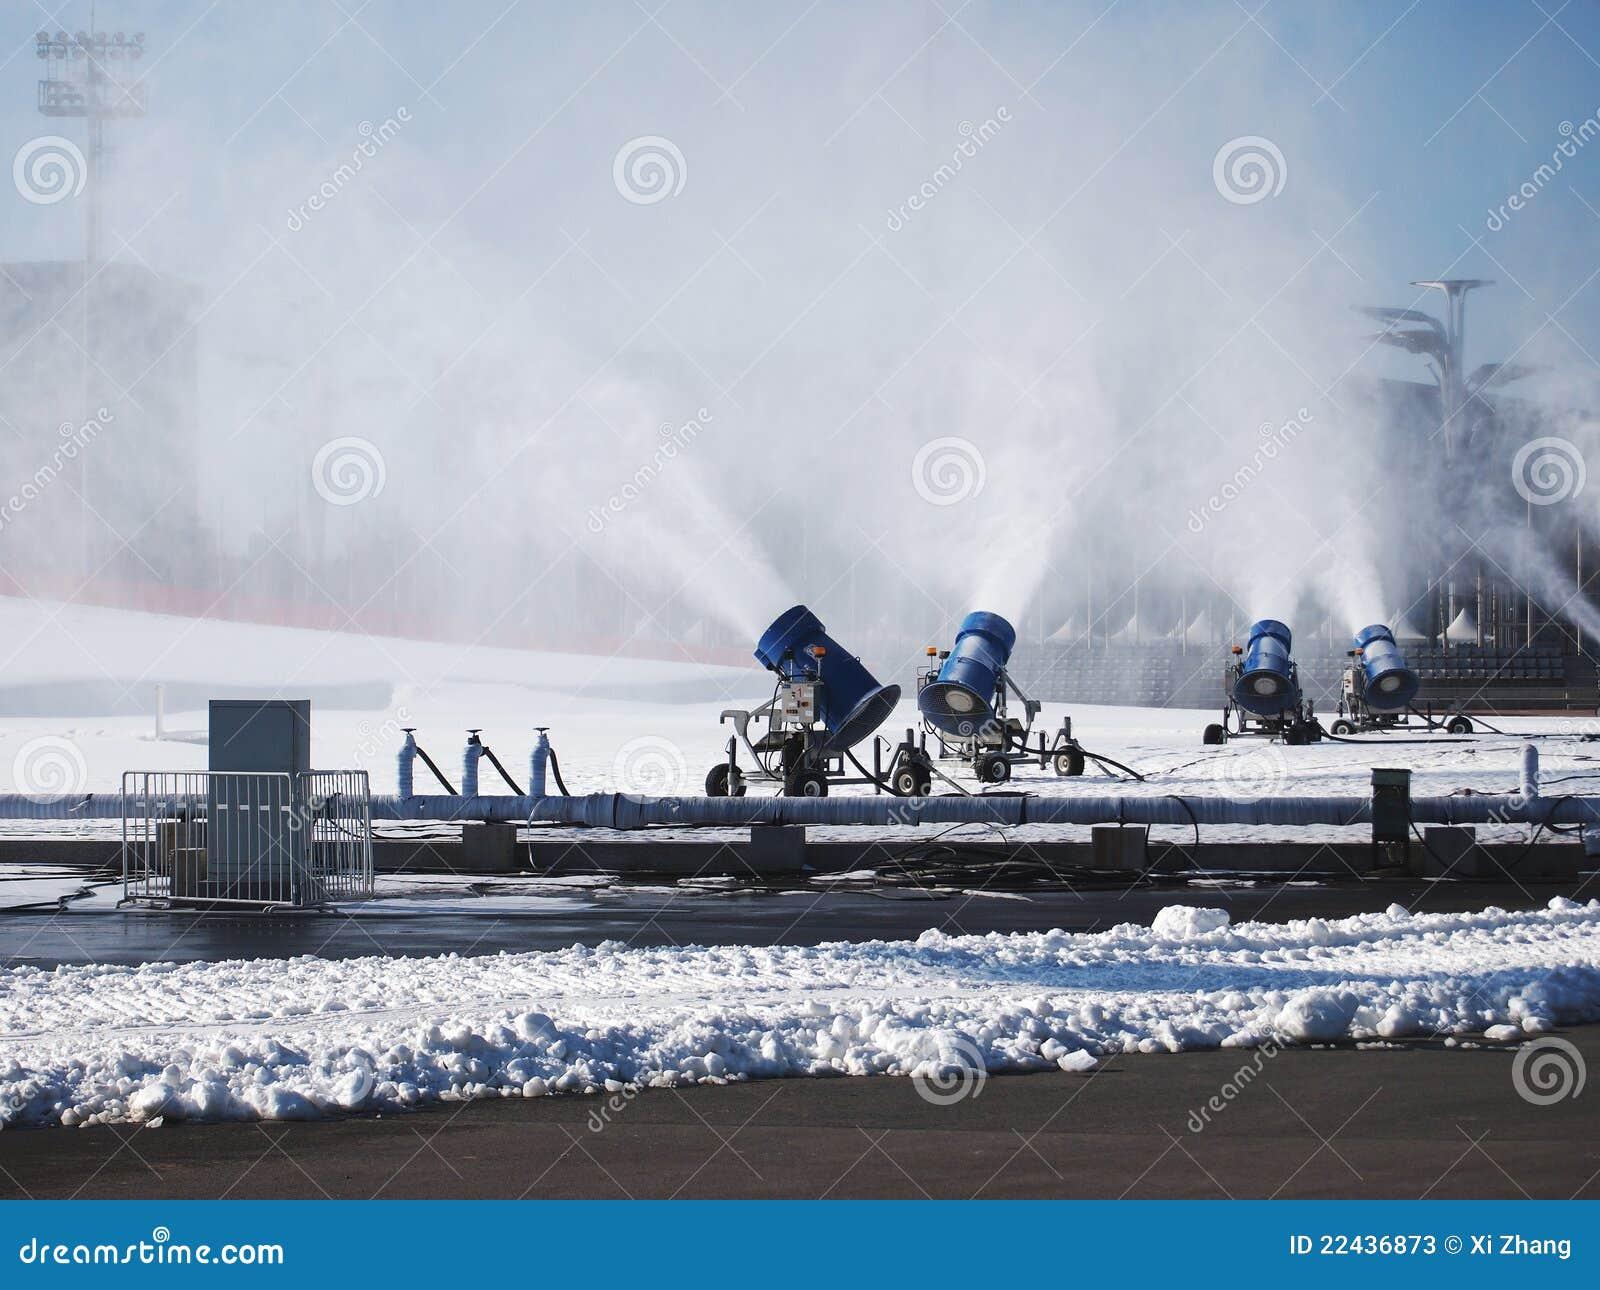 Artificial snow machine stock photos image